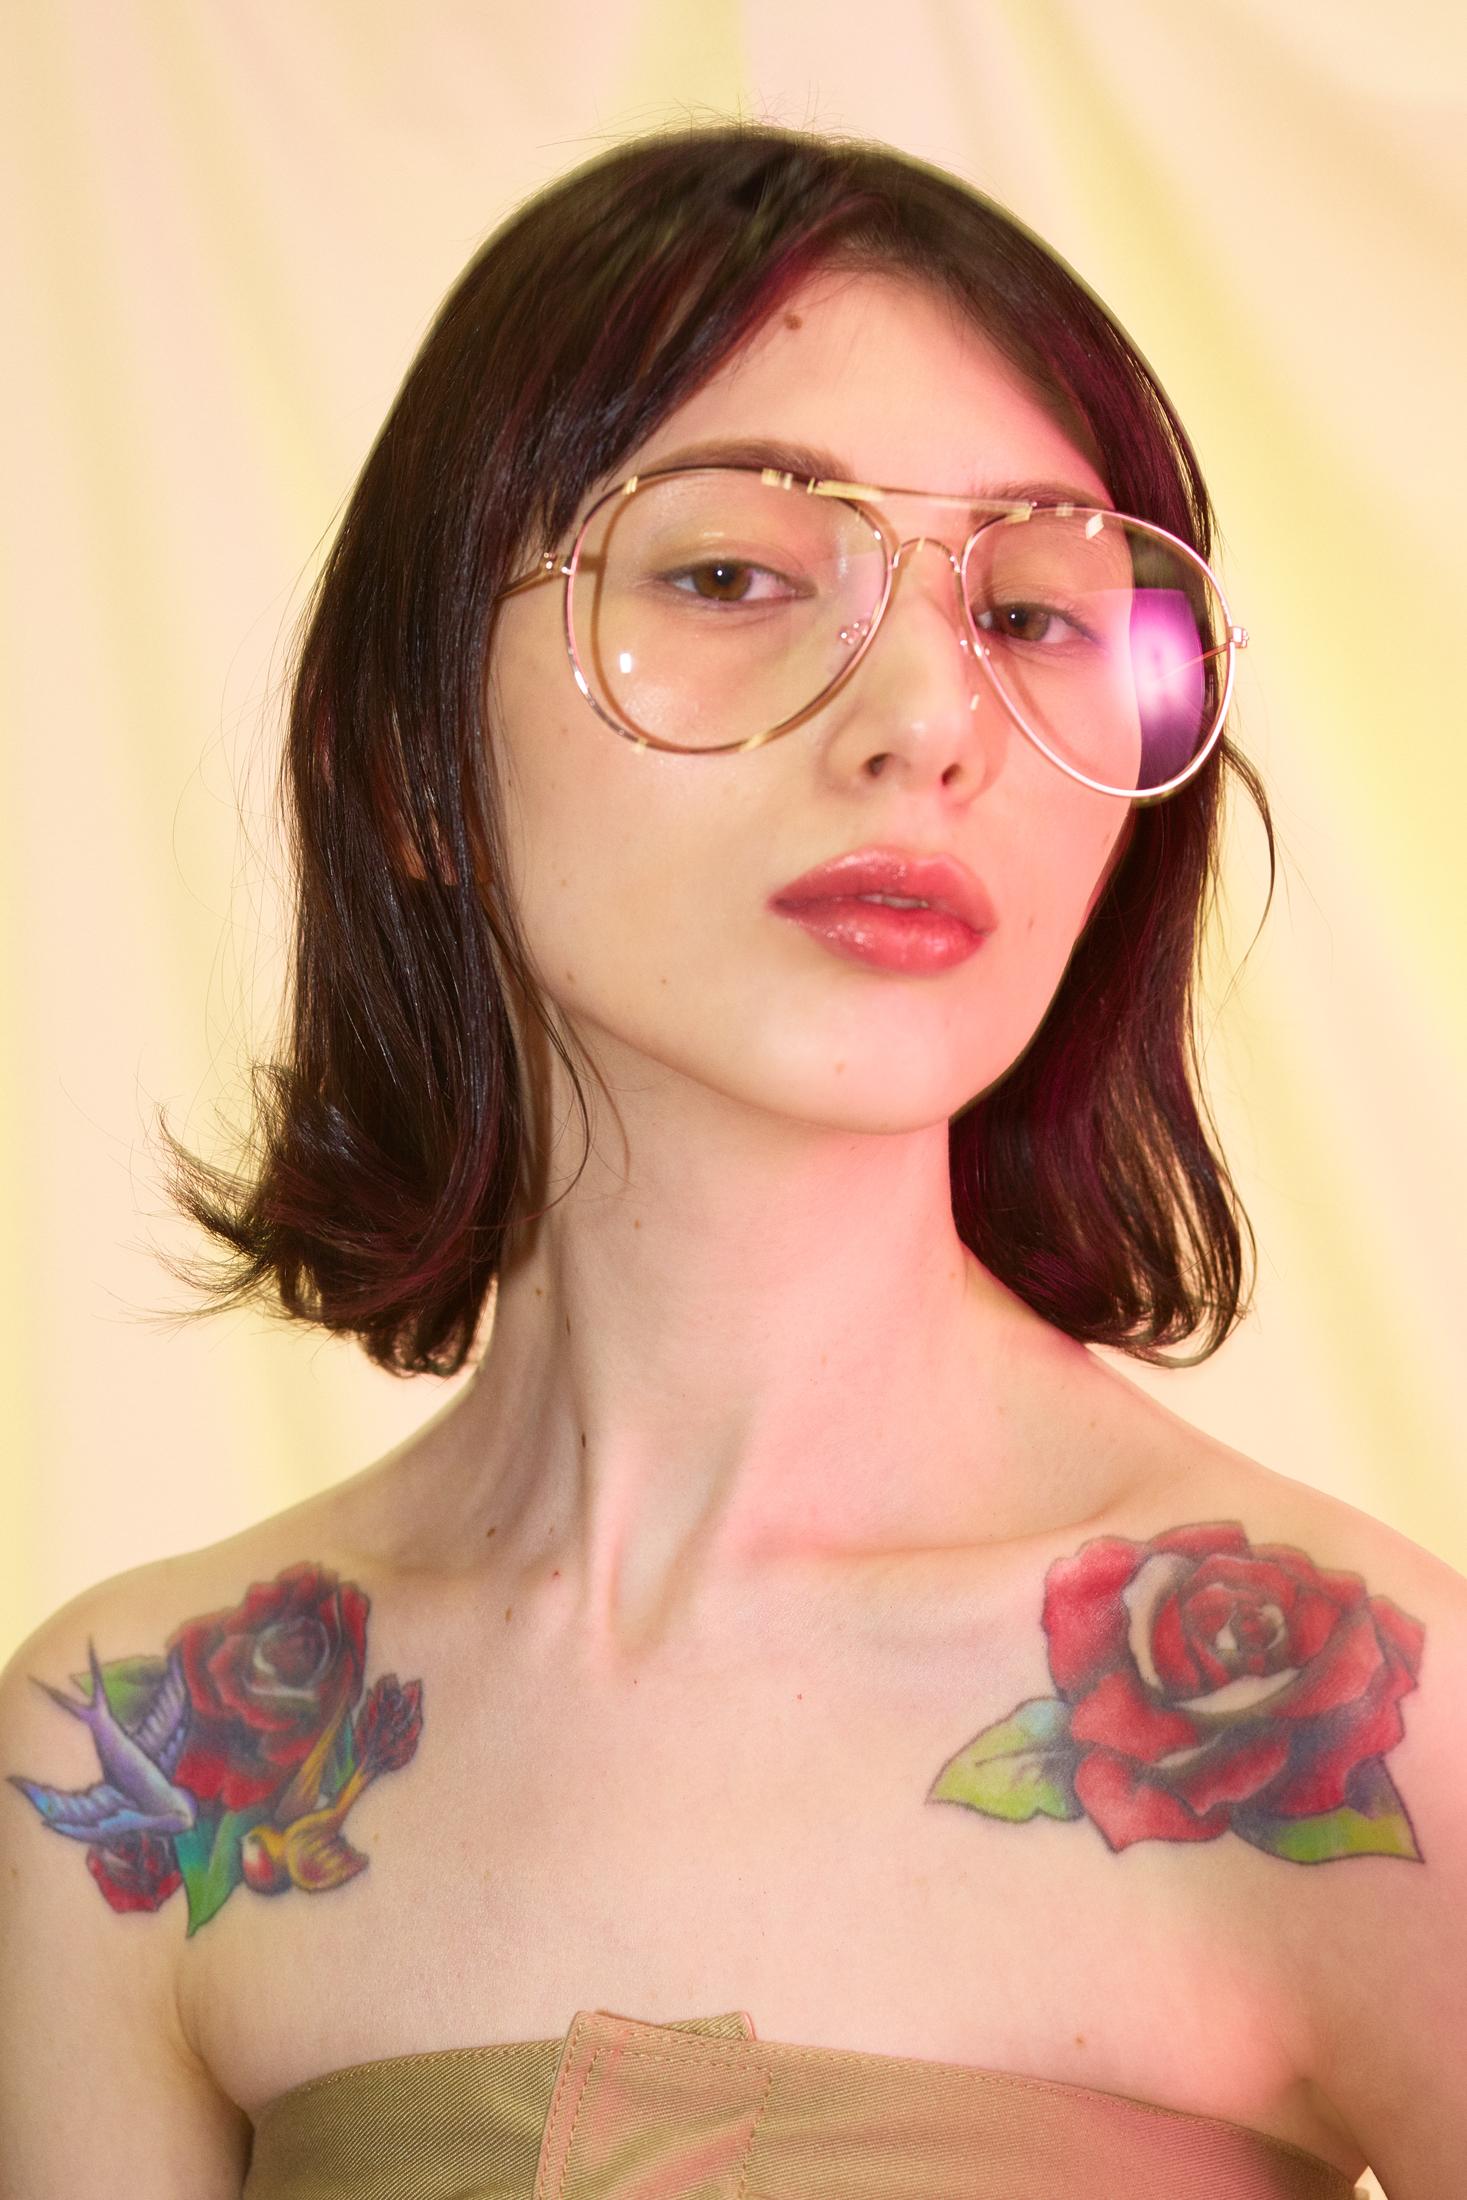 [Inner Poise]  Published on 26 April 2016   Photographer  Toshinori Suzuki  Stylist  Chiaki Tanigawa  Hair & Make up  Seiko Harada  Photo assistant  Syota Kashiwai  Model  Disha at Wizard models